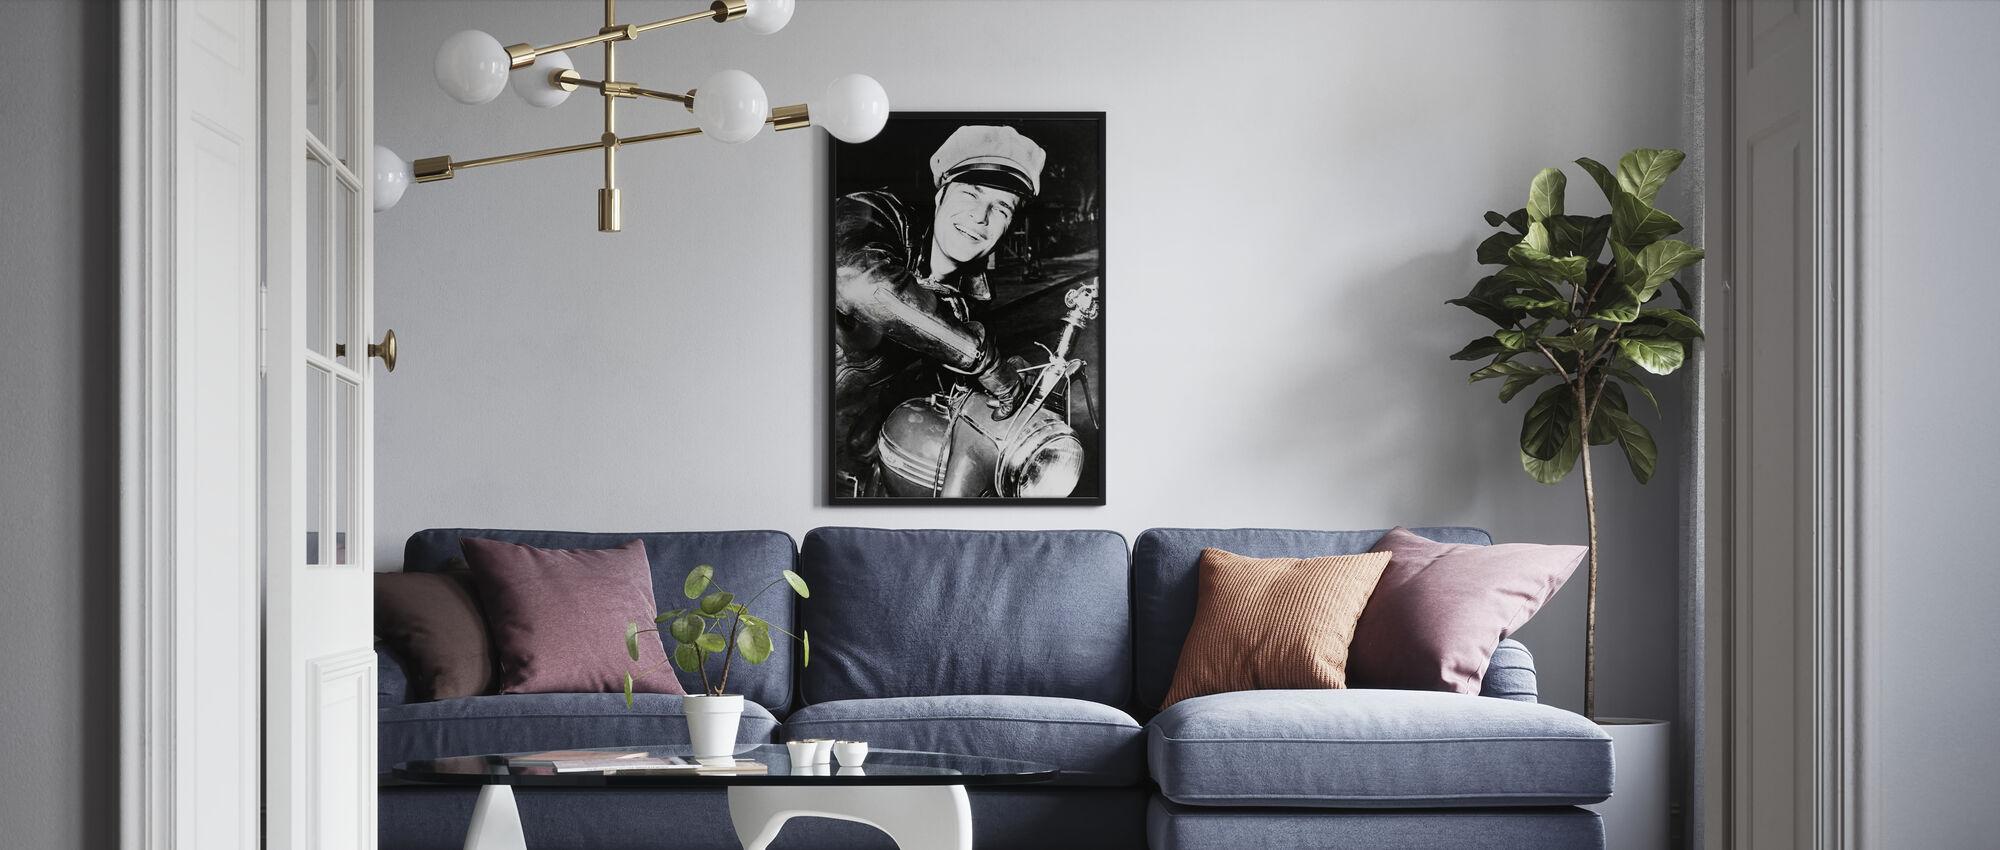 Marlon Brando - Poster - Vardagsrum